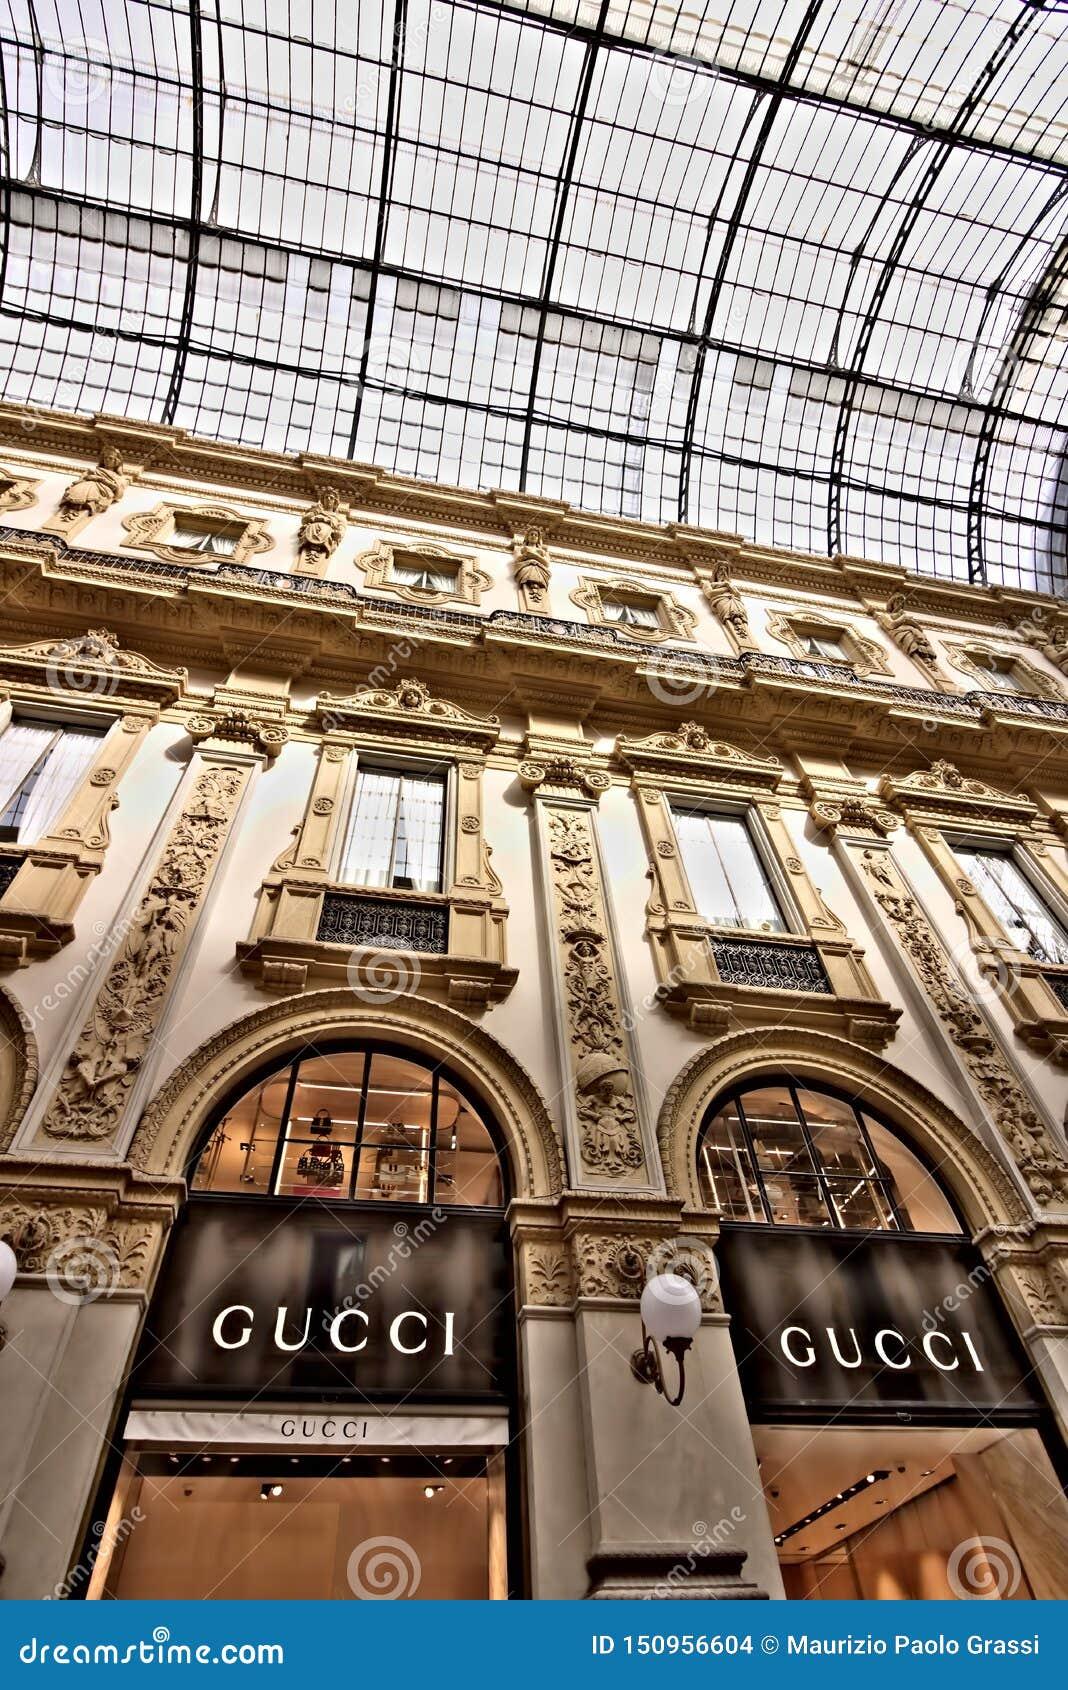 Gucci robi zakupy w Galleria Vittorio Emanuele II w Mediolan